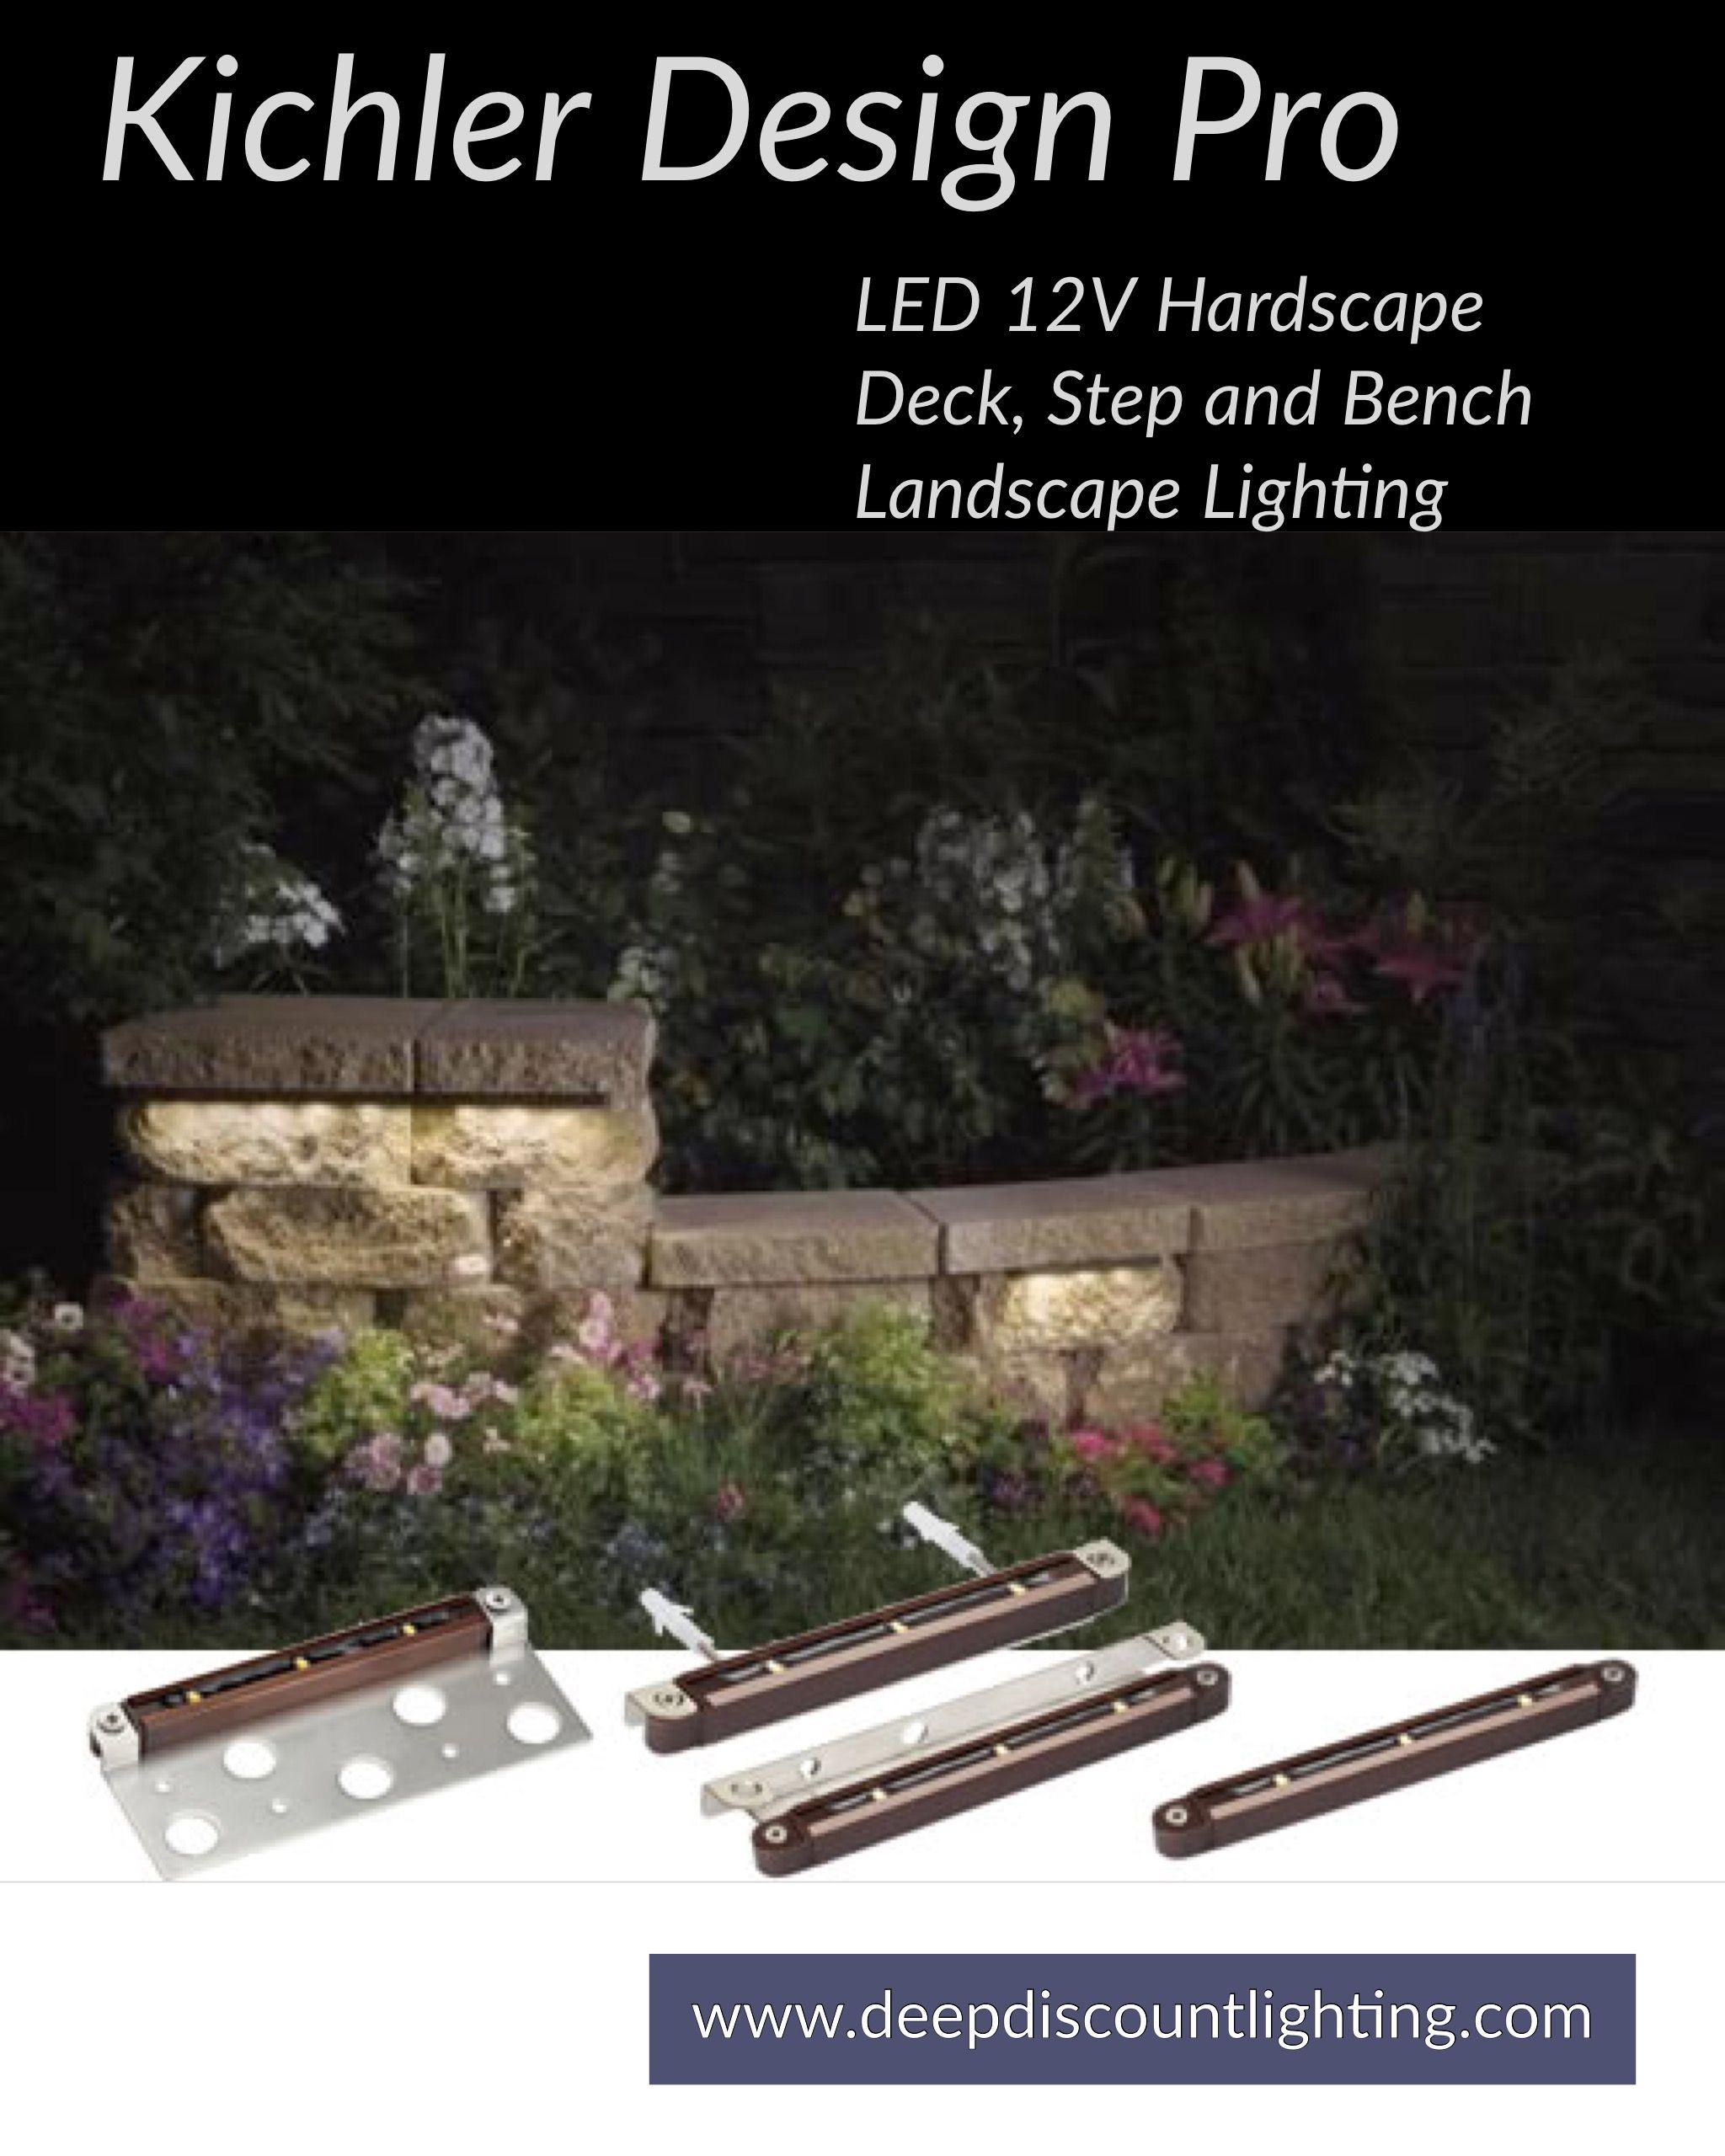 kichler led landscape lighting retaining wall ready to install kichler design pro led 12v hardscape deck step and bench landscape lighting